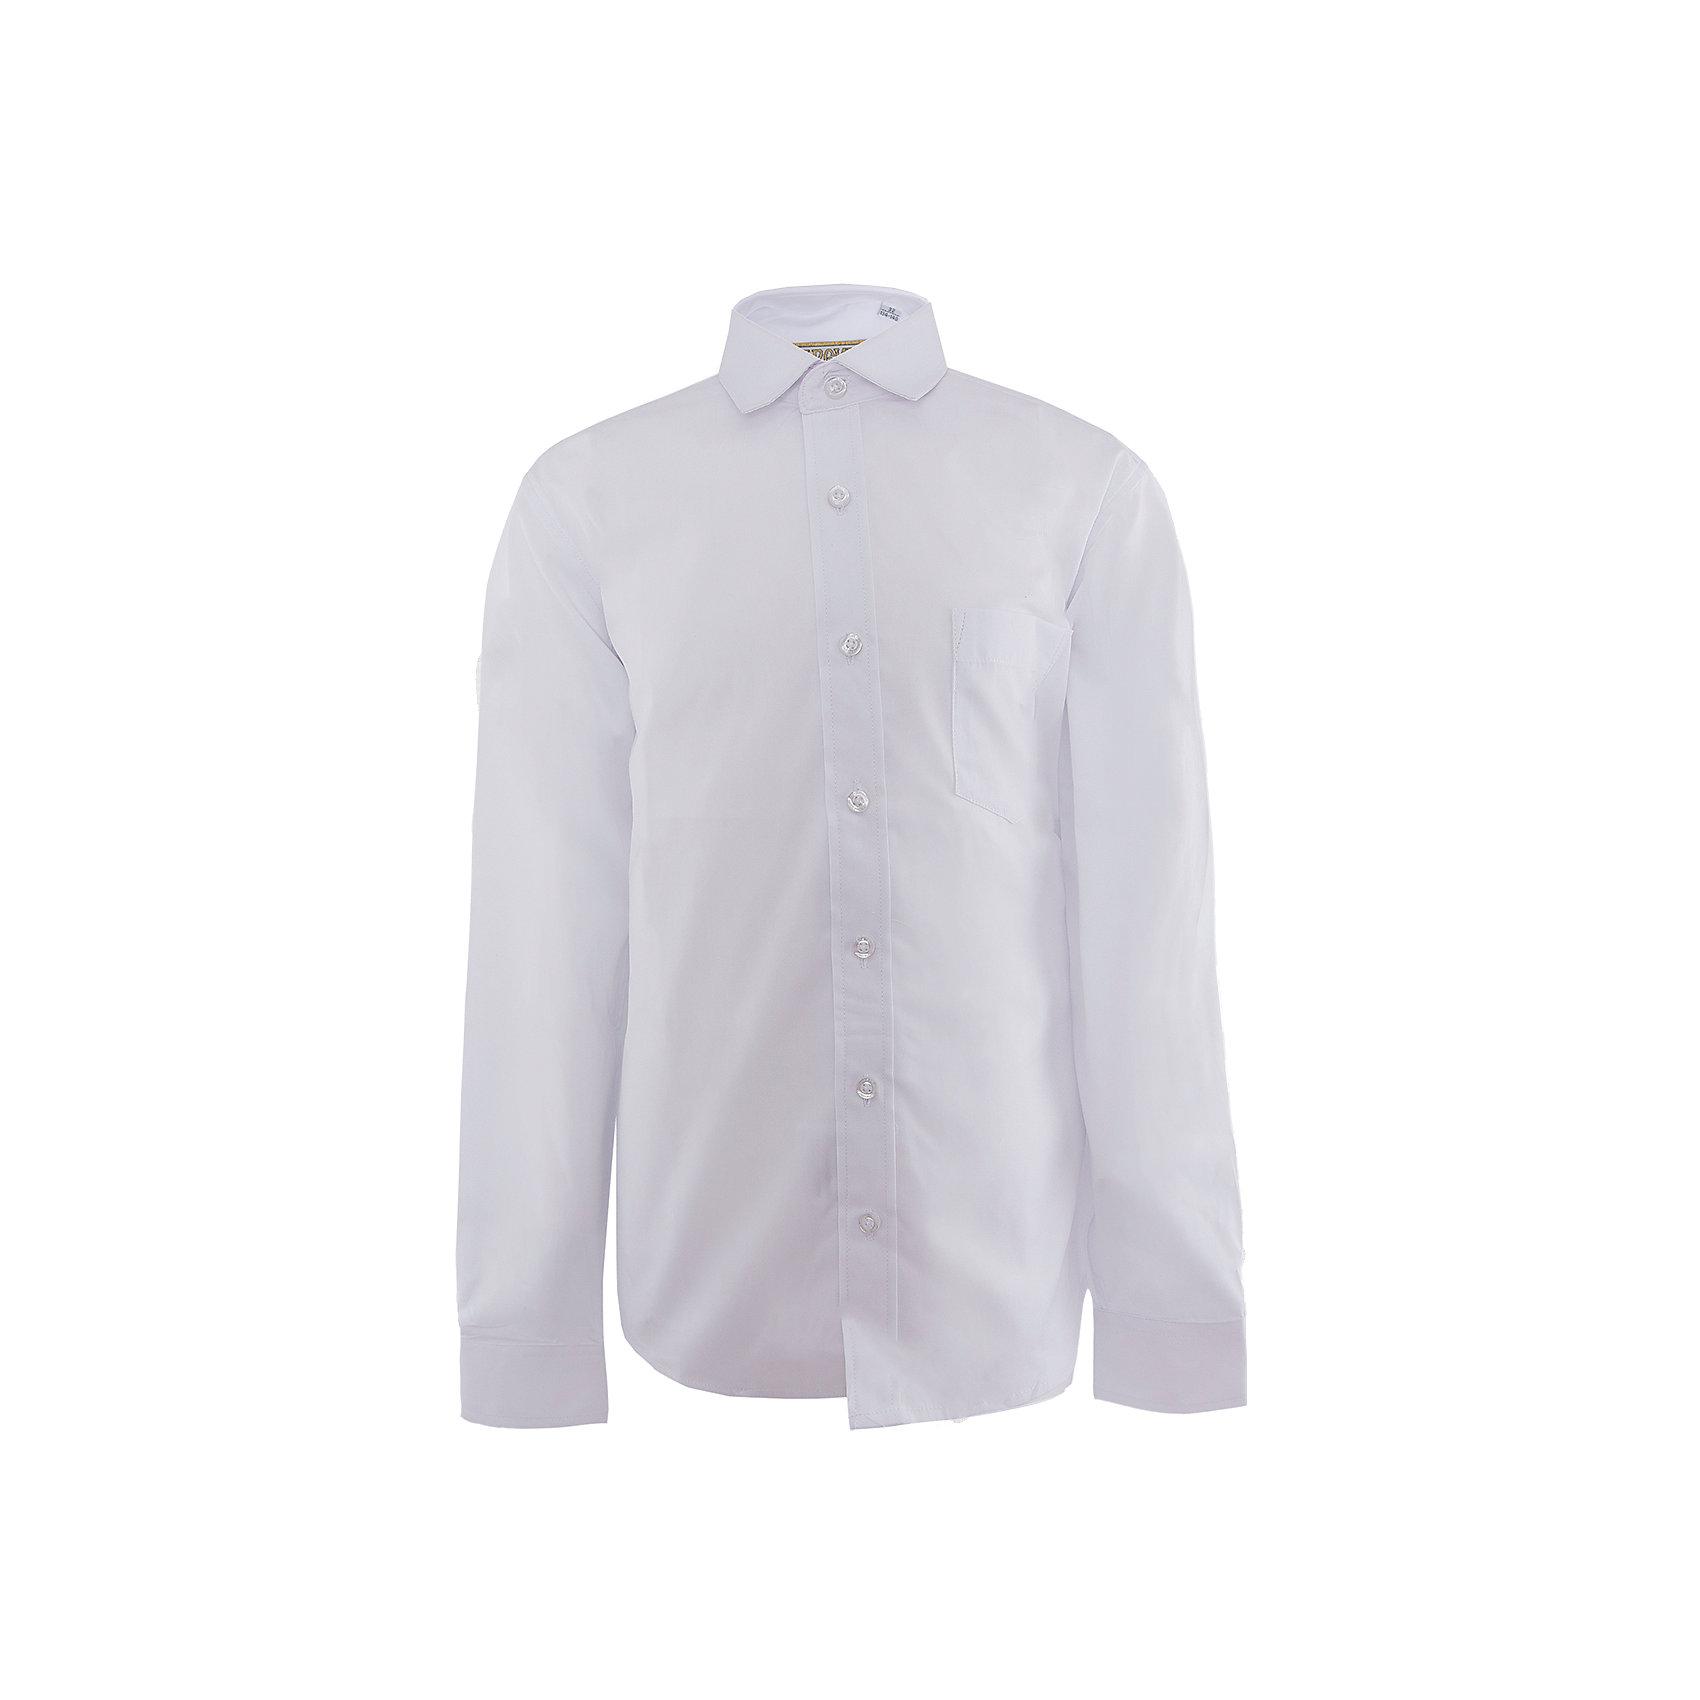 Рубашка для мальчика  TsarevichБлузки и рубашки<br>Рубашка для мальчика от российской марки Tsarevich.<br>Состав:<br>80% хлопок  20% полиэстер<br><br>Ширина мм: 174<br>Глубина мм: 10<br>Высота мм: 169<br>Вес г: 157<br>Цвет: белый<br>Возраст от месяцев: 132<br>Возраст до месяцев: 144<br>Пол: Мужской<br>Возраст: Детский<br>Размер: 146/152,122/128,140/146,158/164,134/140,128/134,164/170,152/158<br>SKU: 4163776